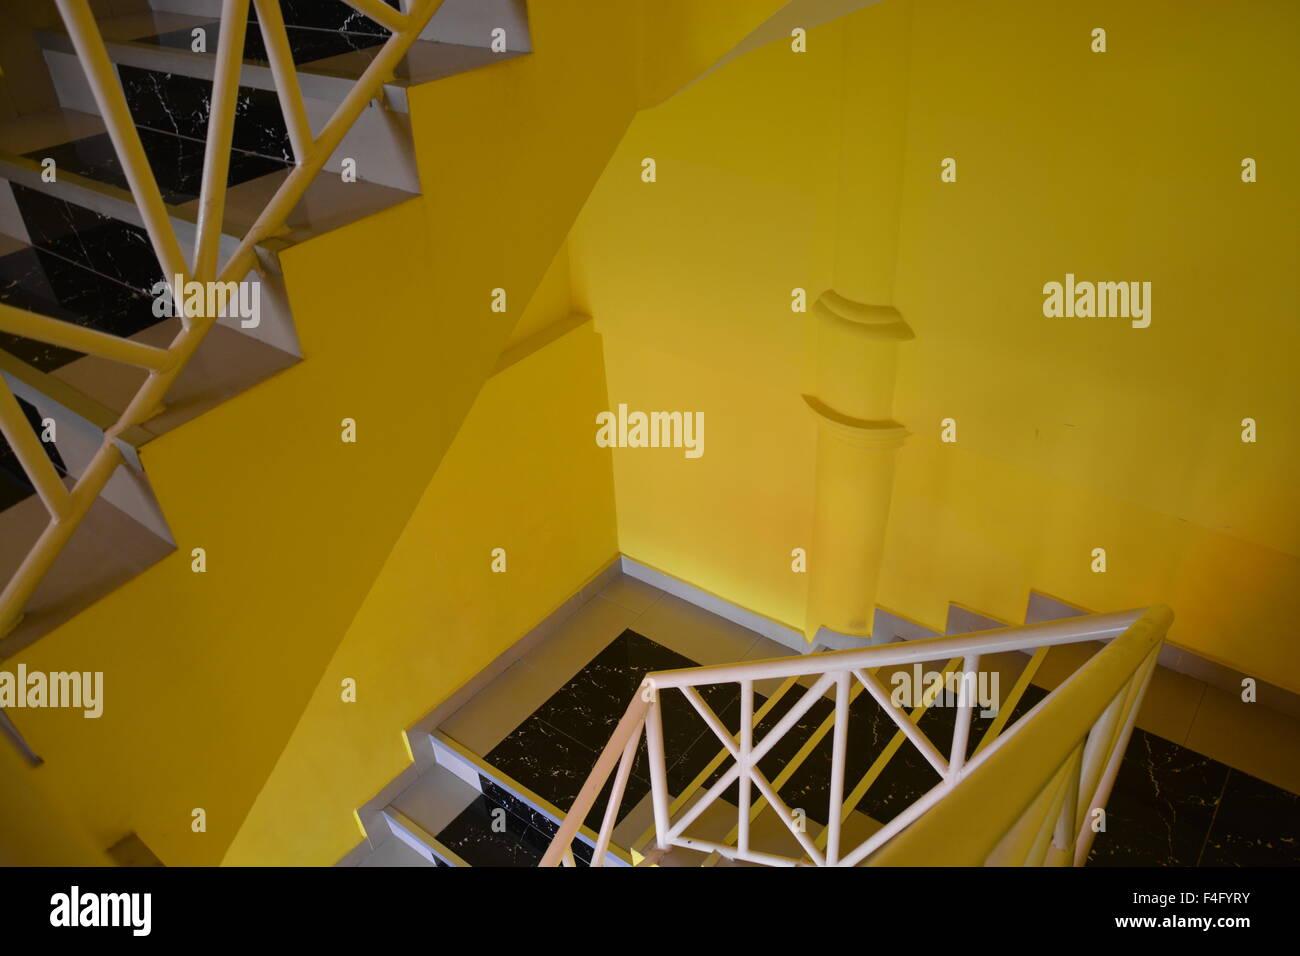 Yellow school staircase - Stock Image